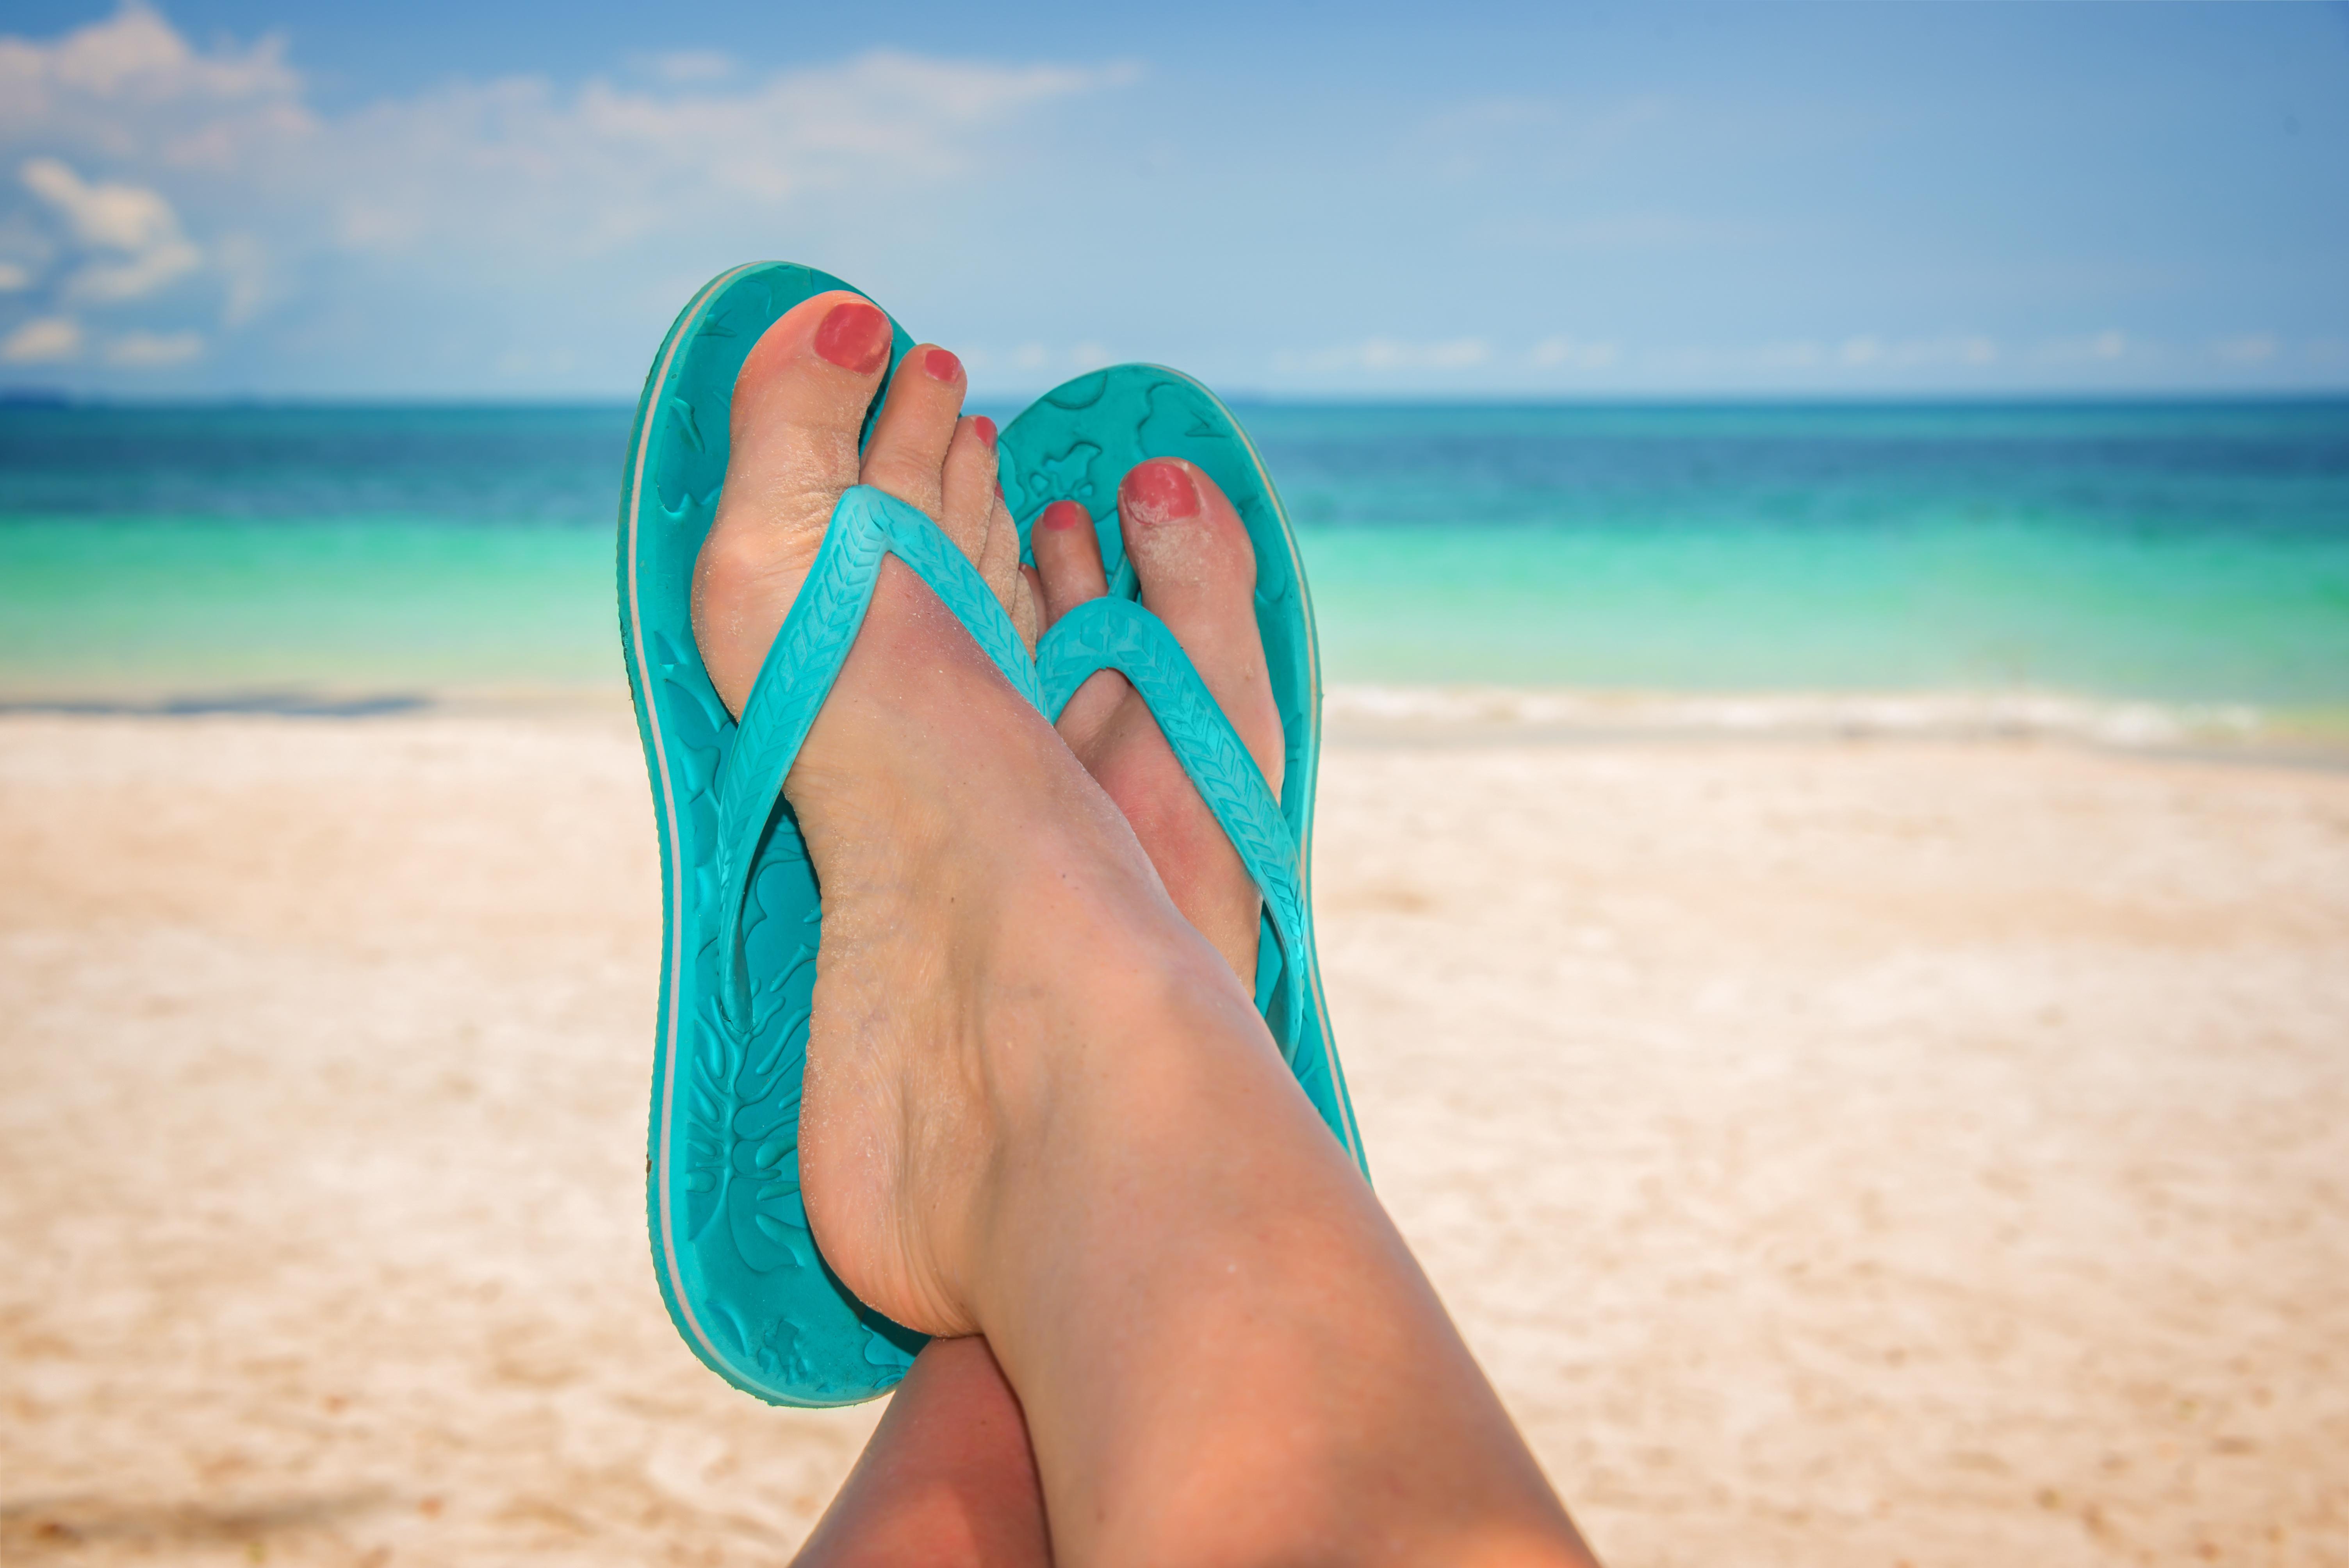 Frauenfüße in Flip-Flops am Meeresstrand